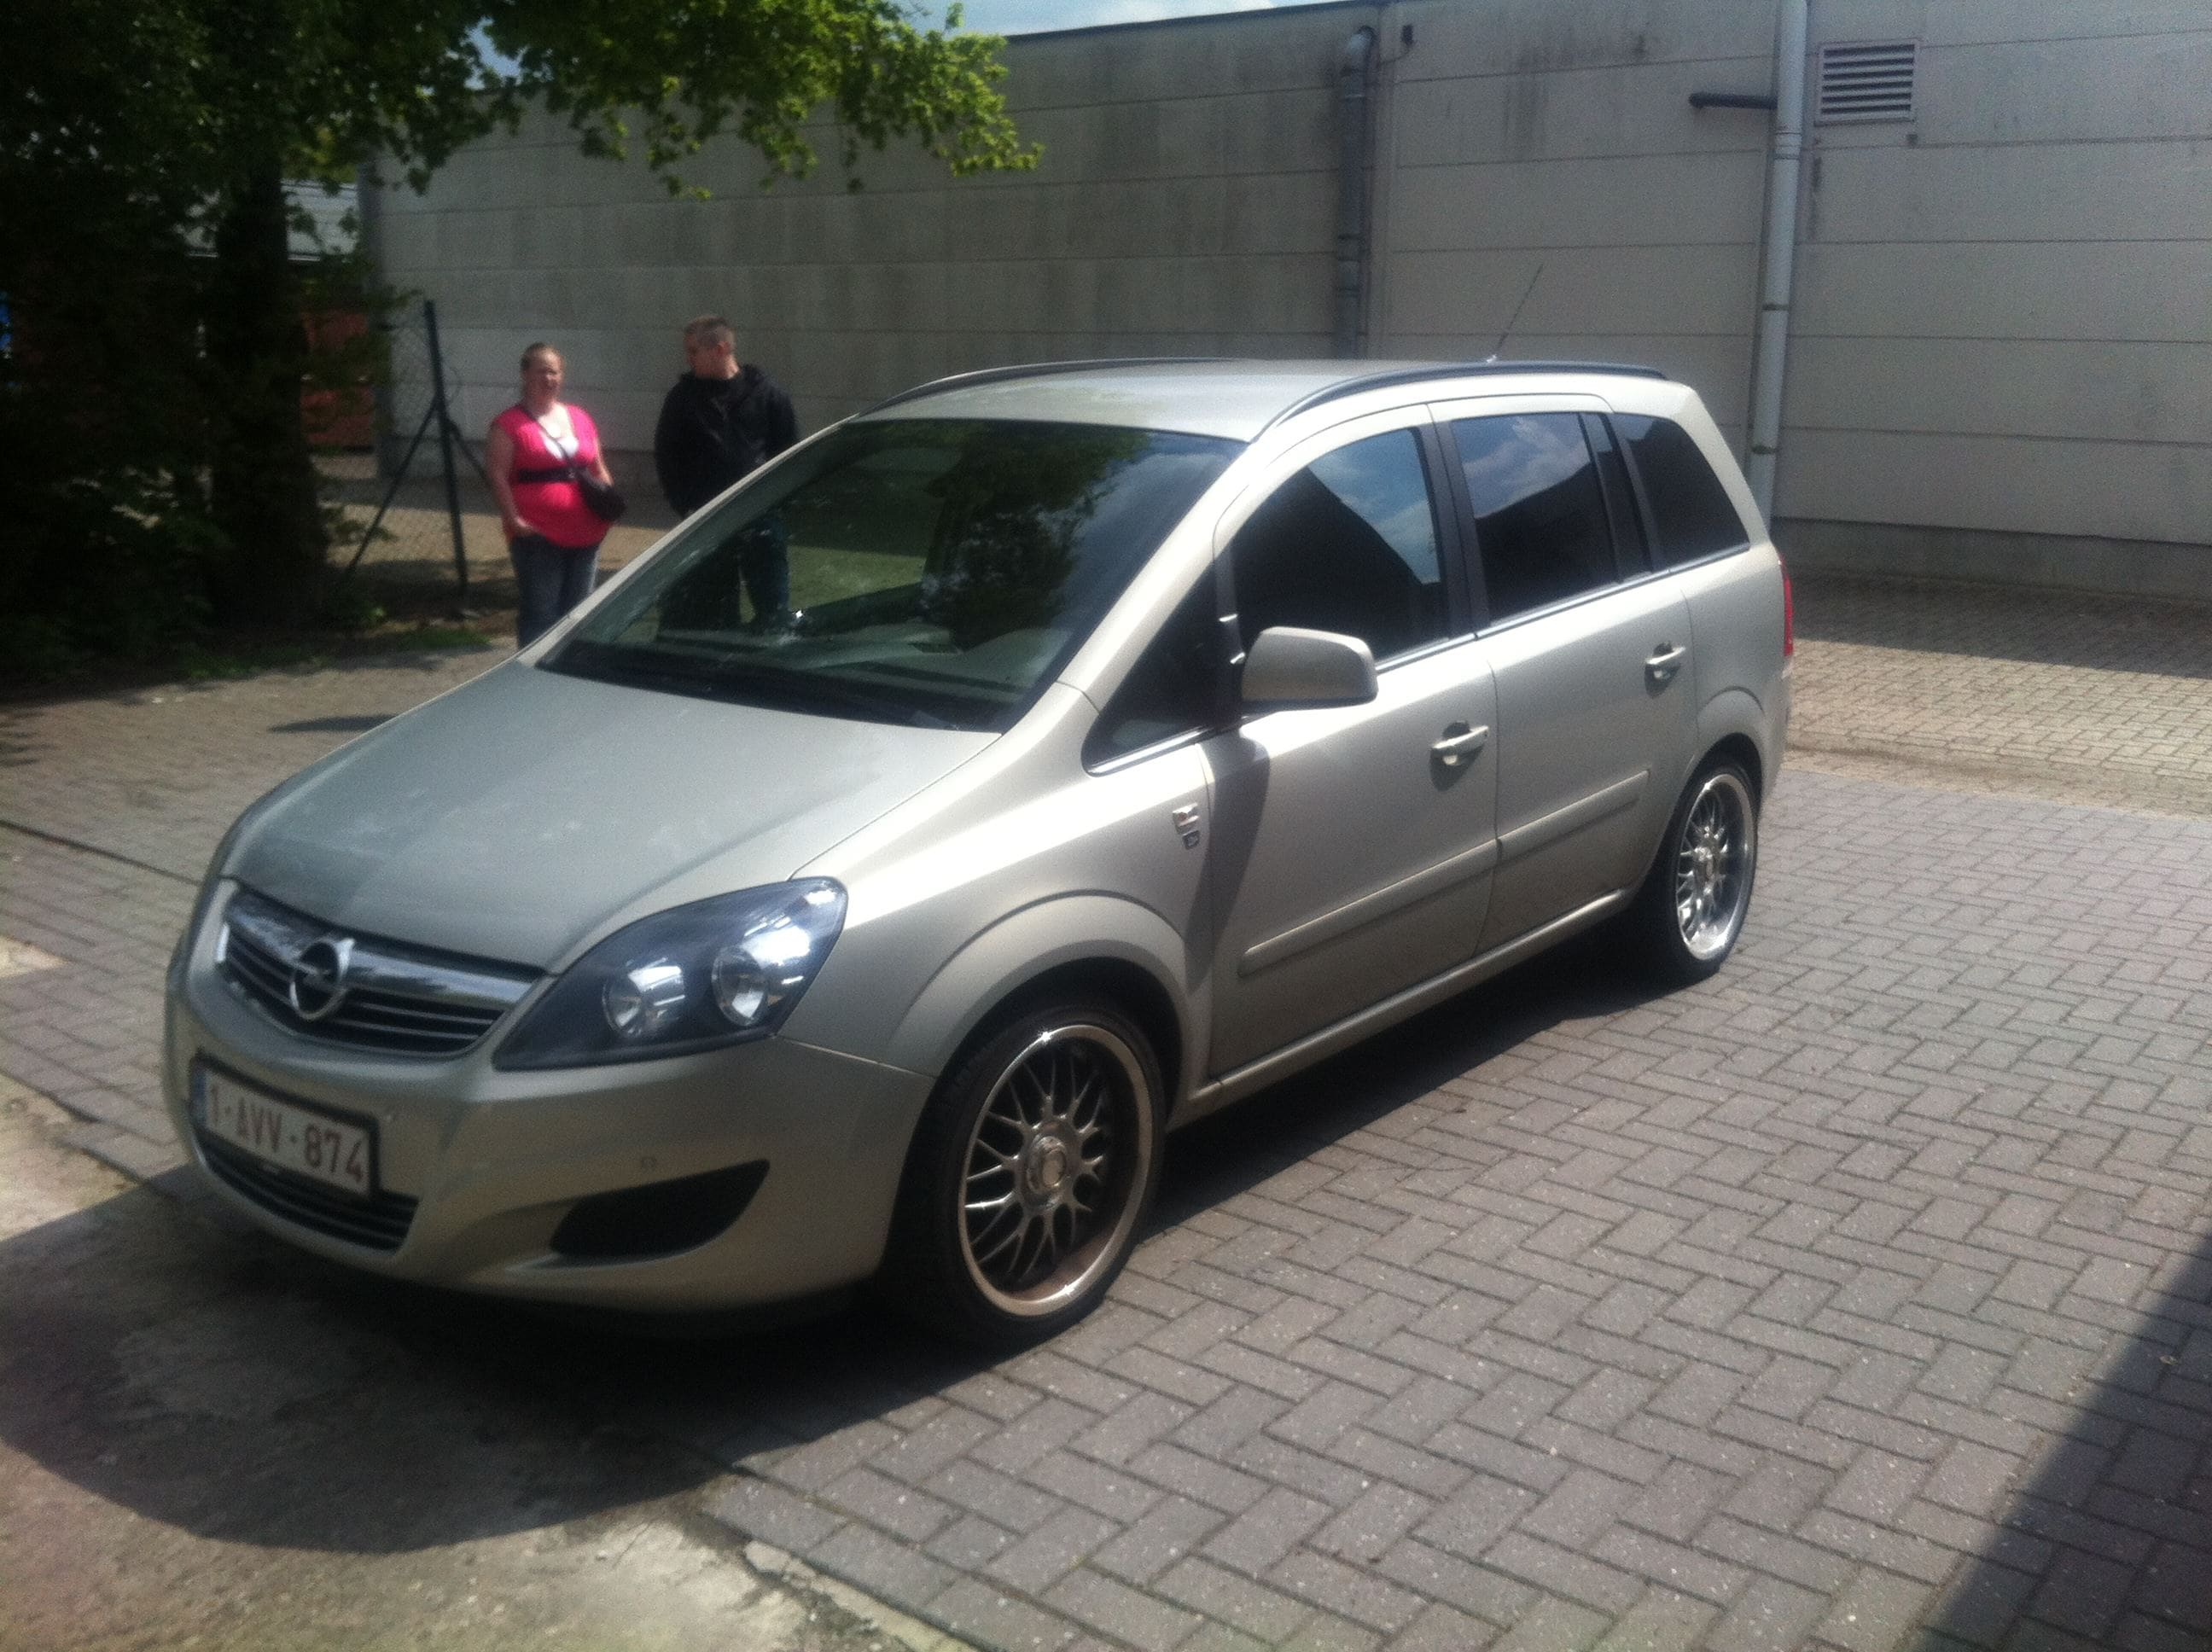 Opel Zafira met Two-Tone Wrap, Carwrapping door Wrapmyride.nu Foto-nr:6663, ©2021